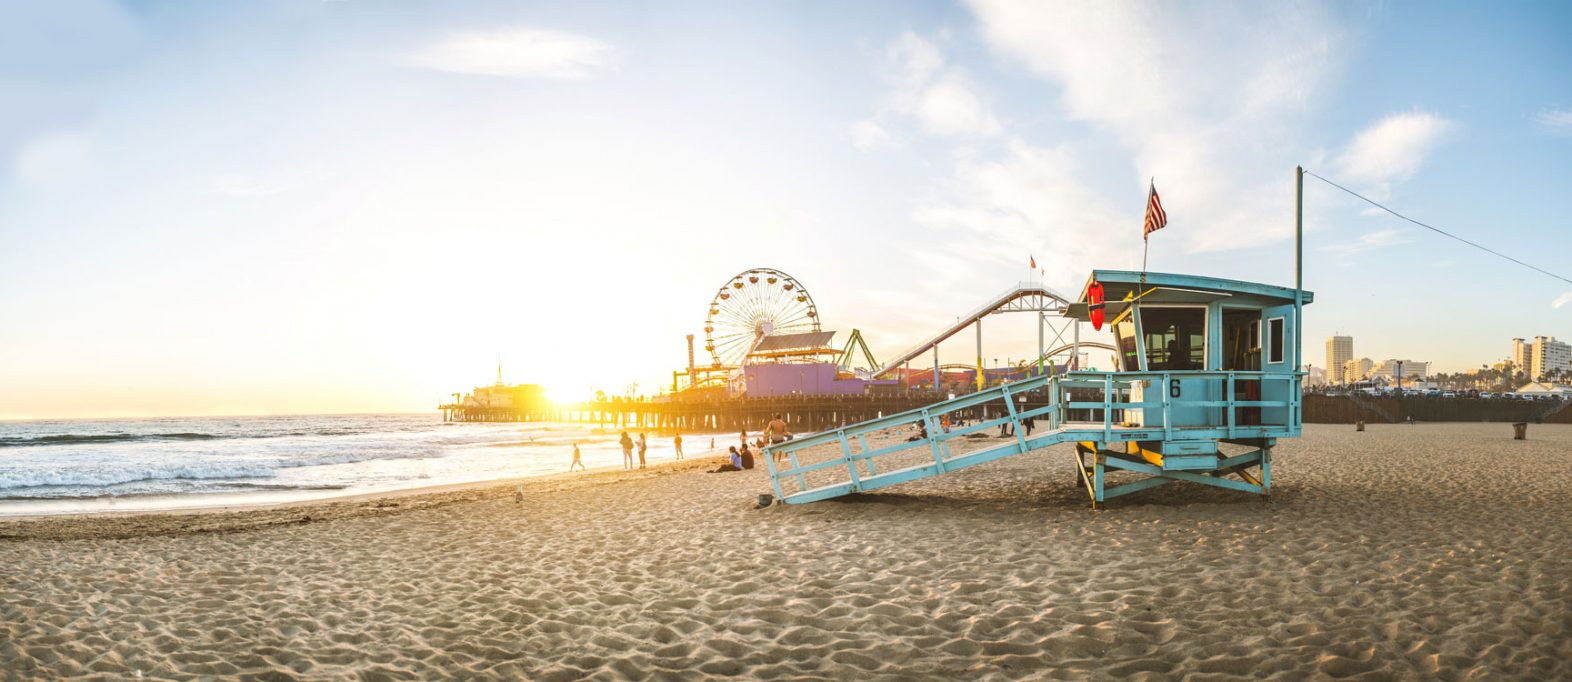 Santa Monica Pier |credit: Adobe Stock ID 139629299